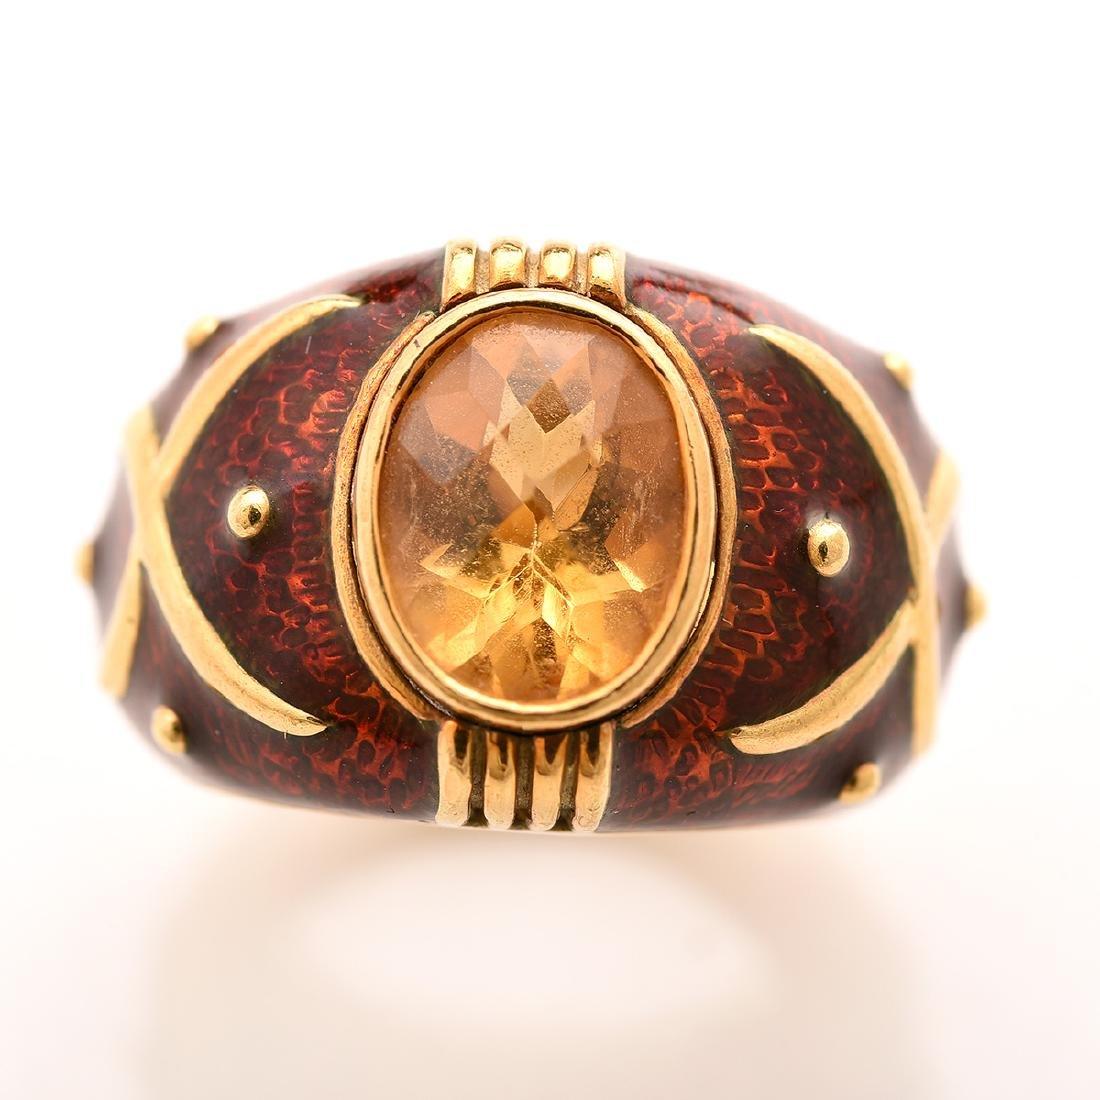 Citrine, Guilloche Enamel, 18k Yellow Gold Ring. - 2